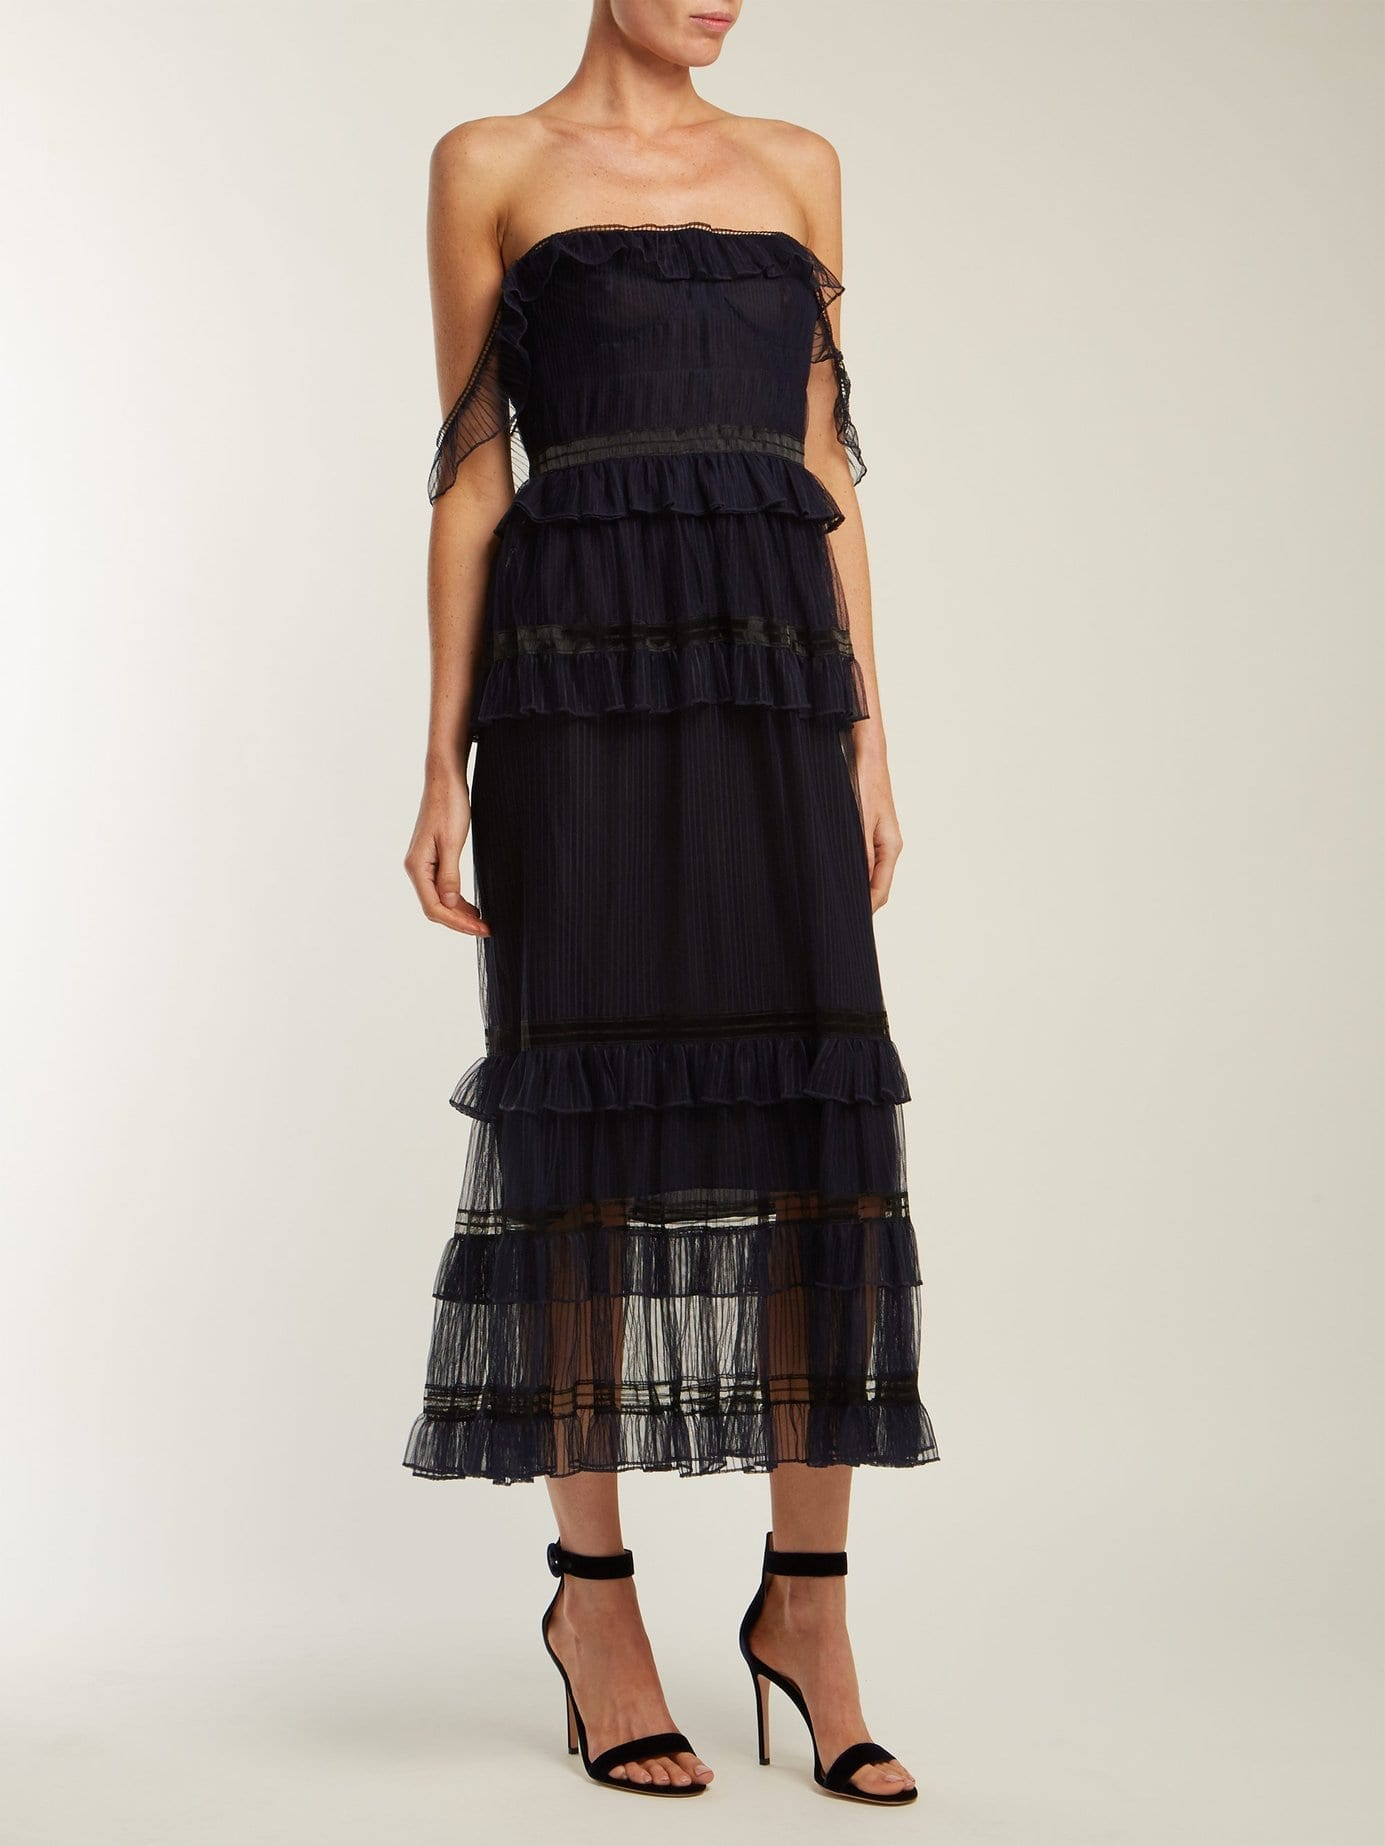 121fb9e9a0 JONATHAN SIMKHAI Strapless Ruffled Tulle Navy Dress - We Select Dresses